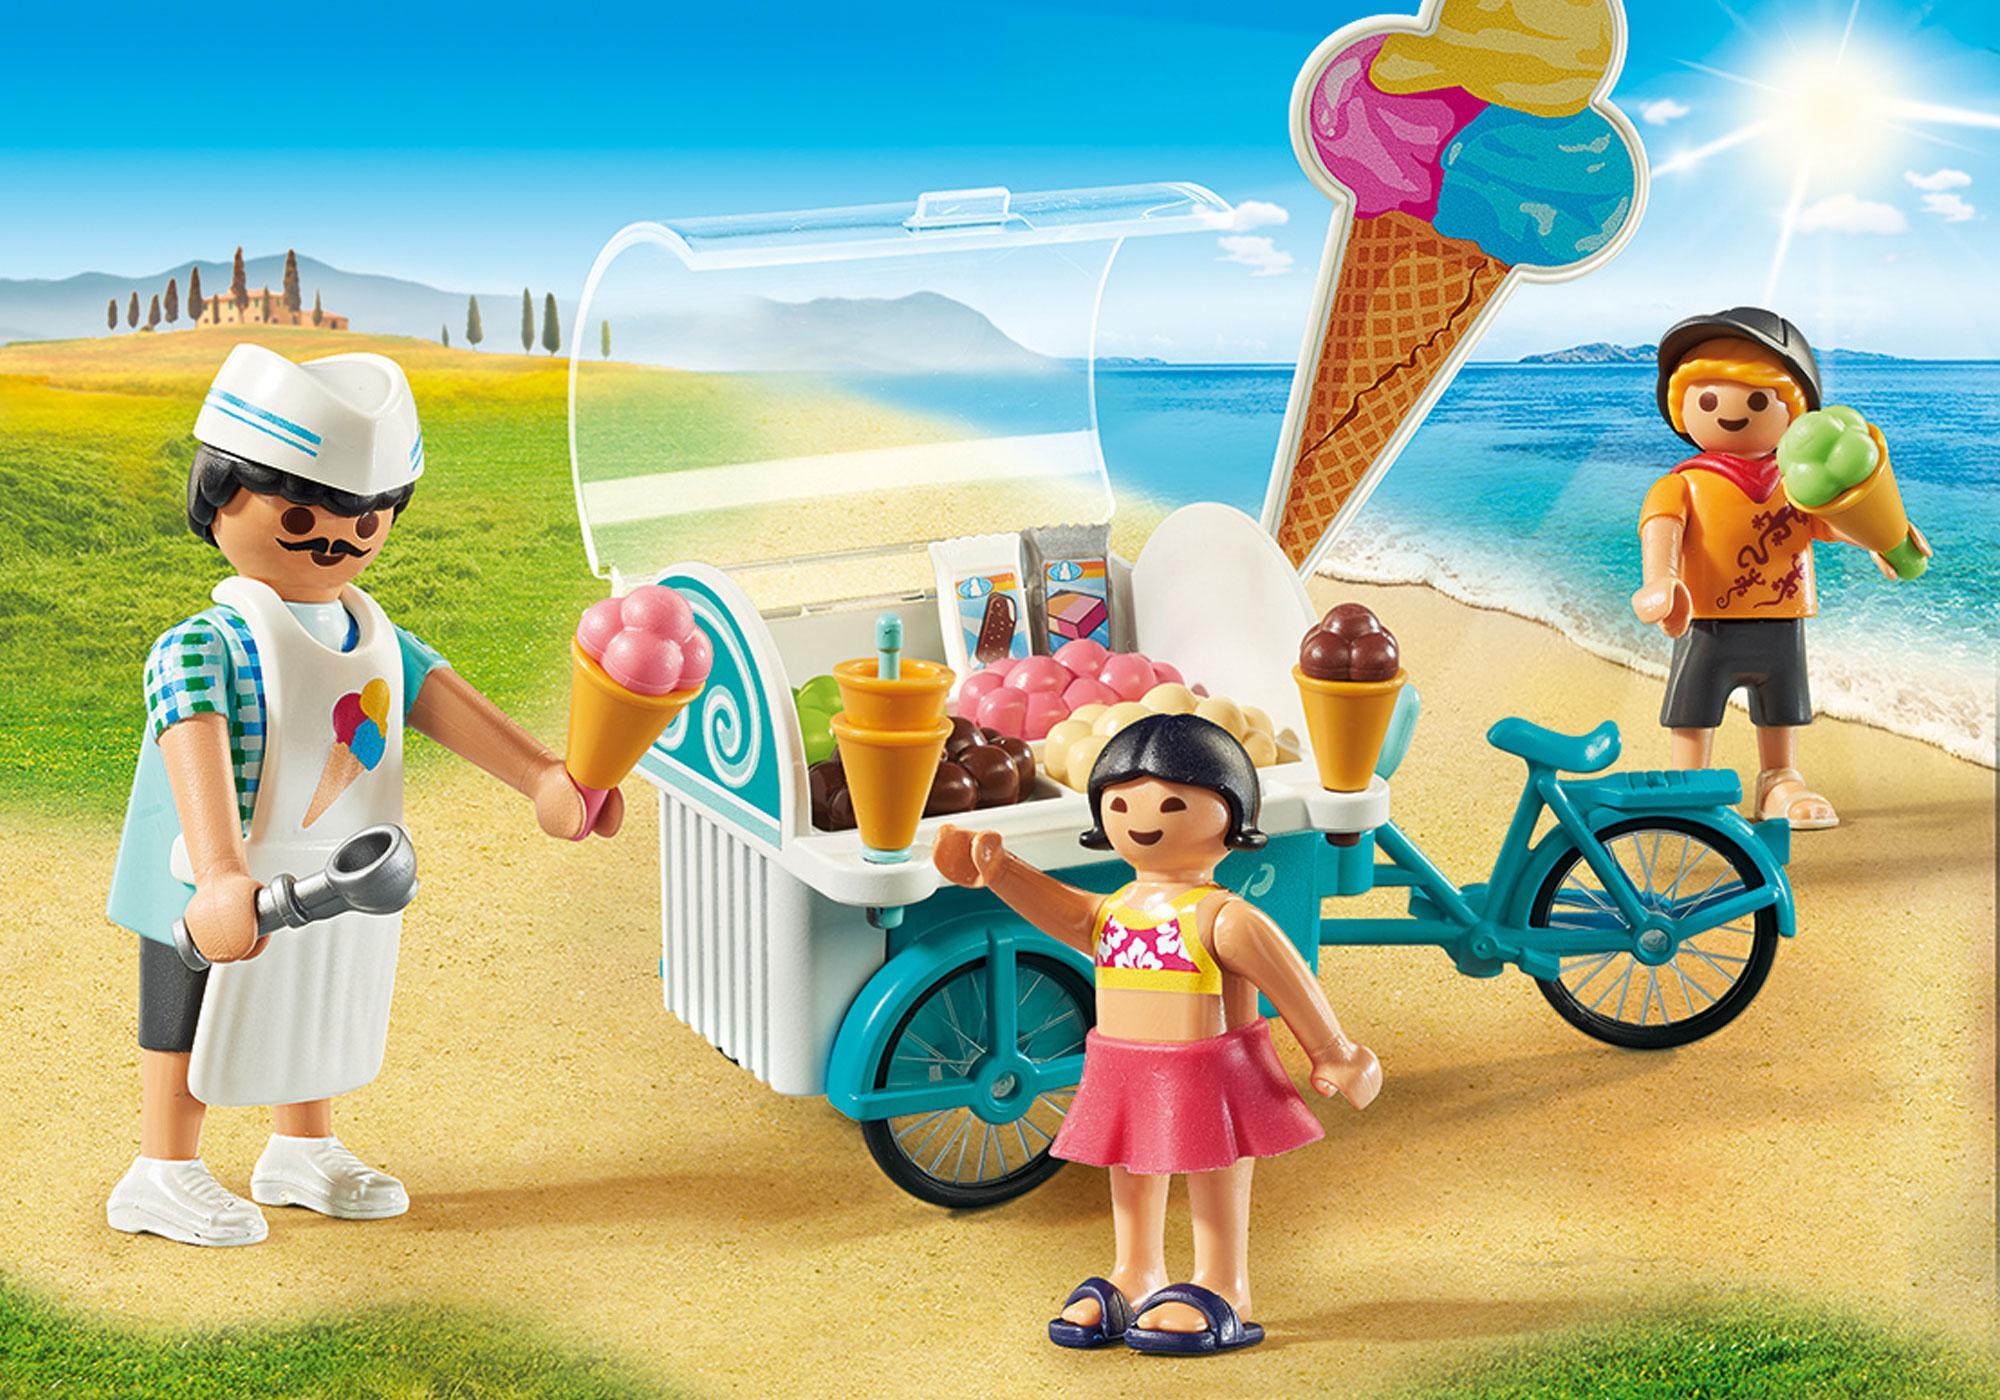 http://media.playmobil.com/i/playmobil/9426_product_detail/Fahrrad mit Eiswagen